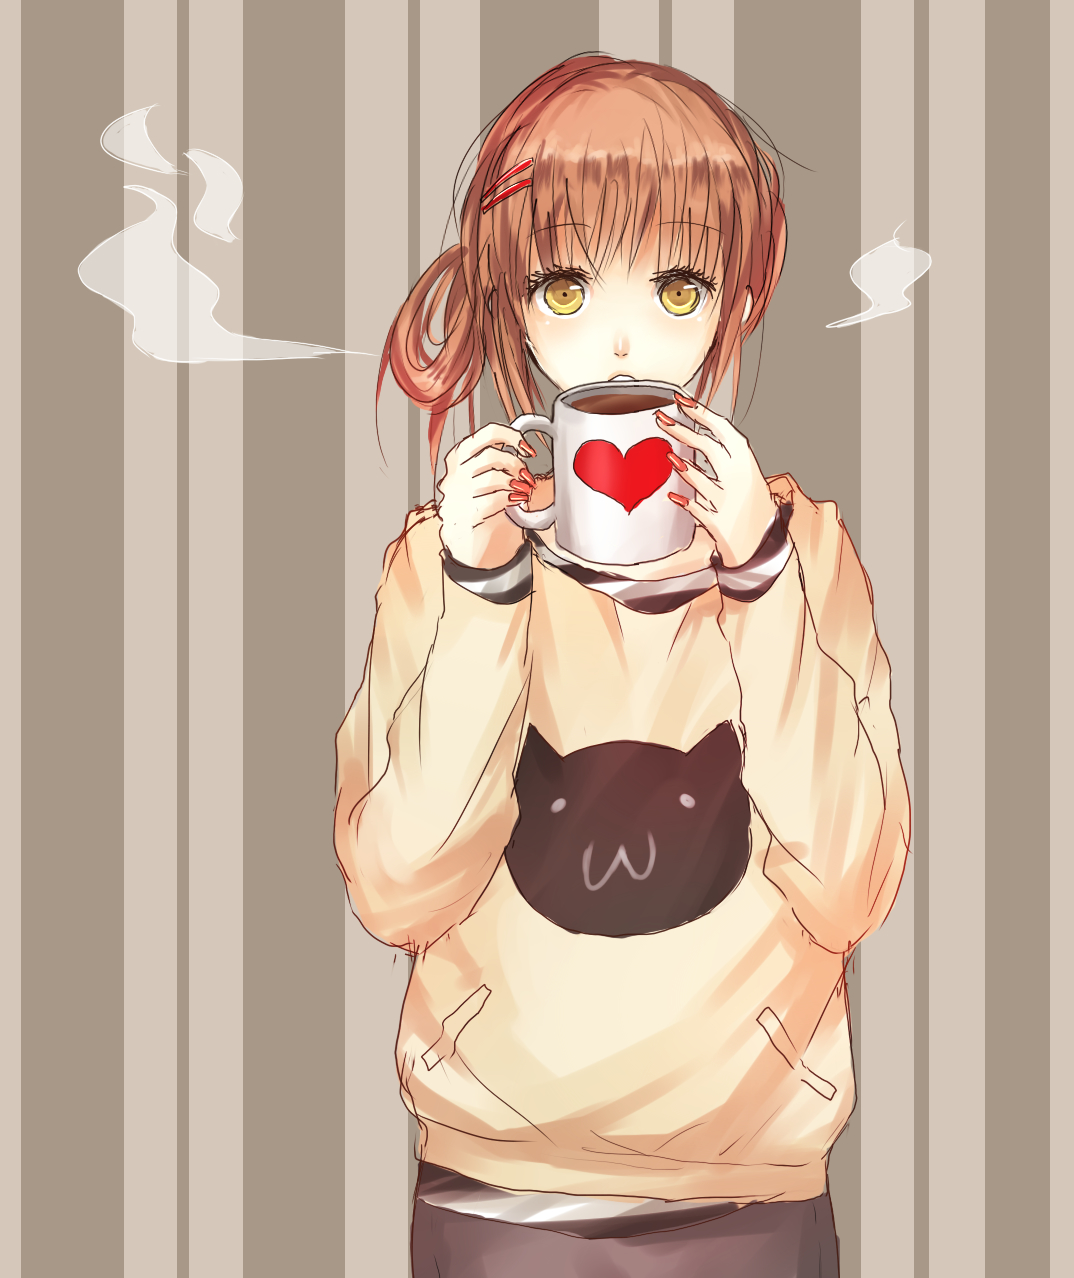 Zerochan Anime Image Board: Spazzytoaster Image #1644186